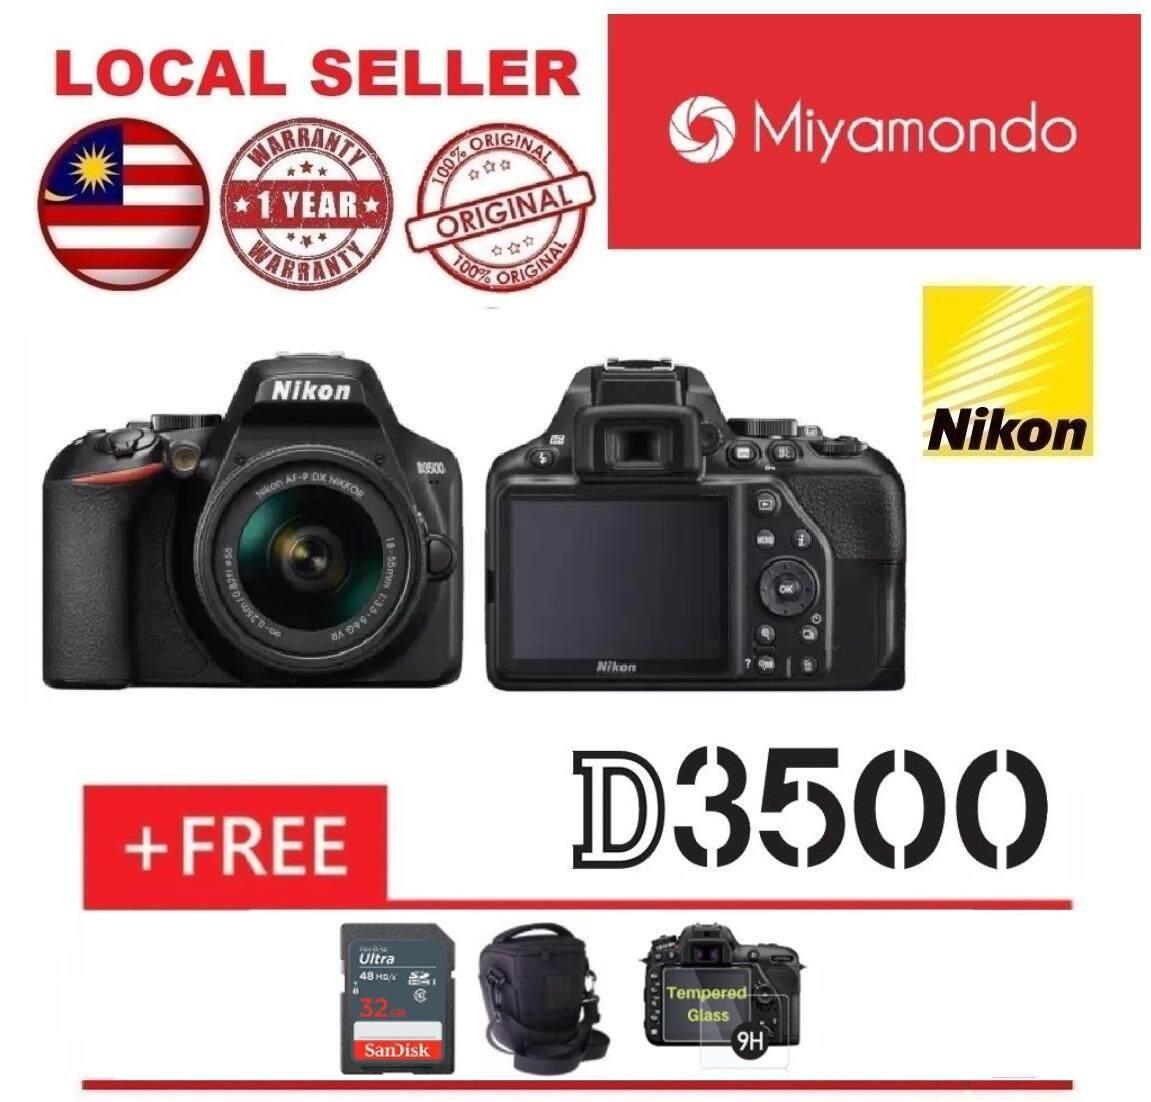 Nikon D3500 Dslr Camera With 18 55mm Lens 32gb Bag Tempered Glass